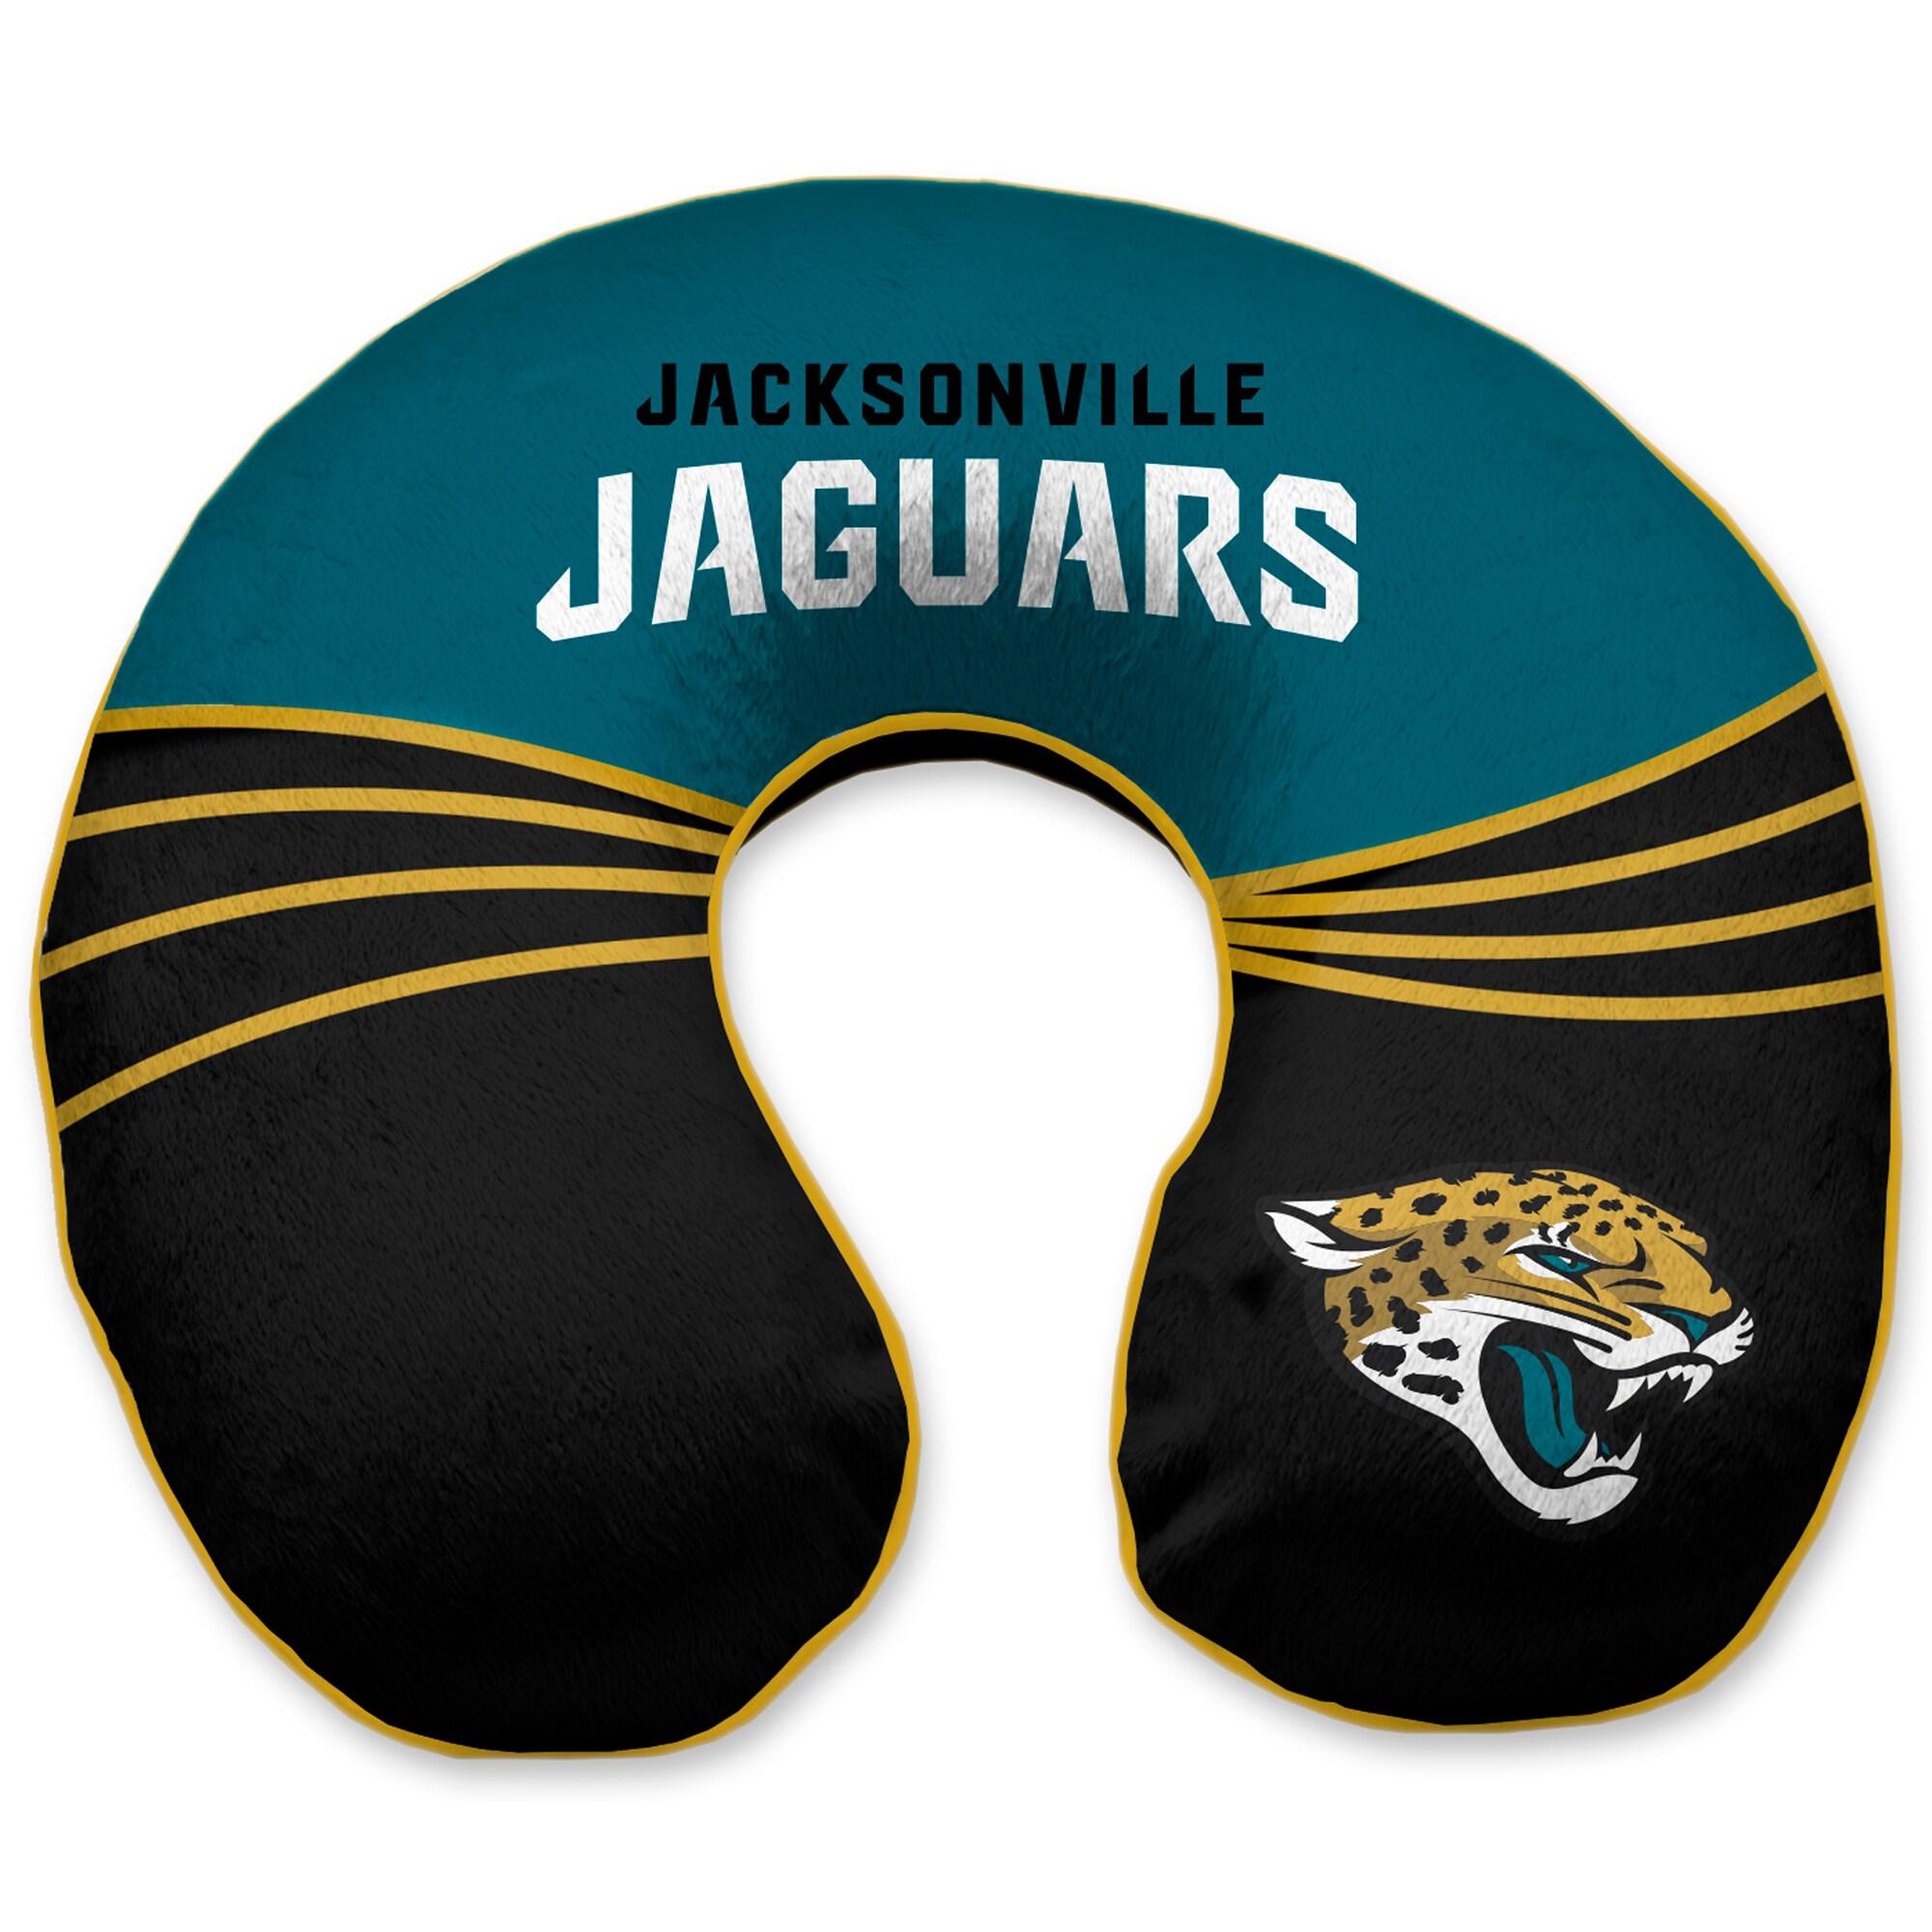 Jacksonville Jaguars Wave Memory Foam U-Neck Travel Pillow - Green